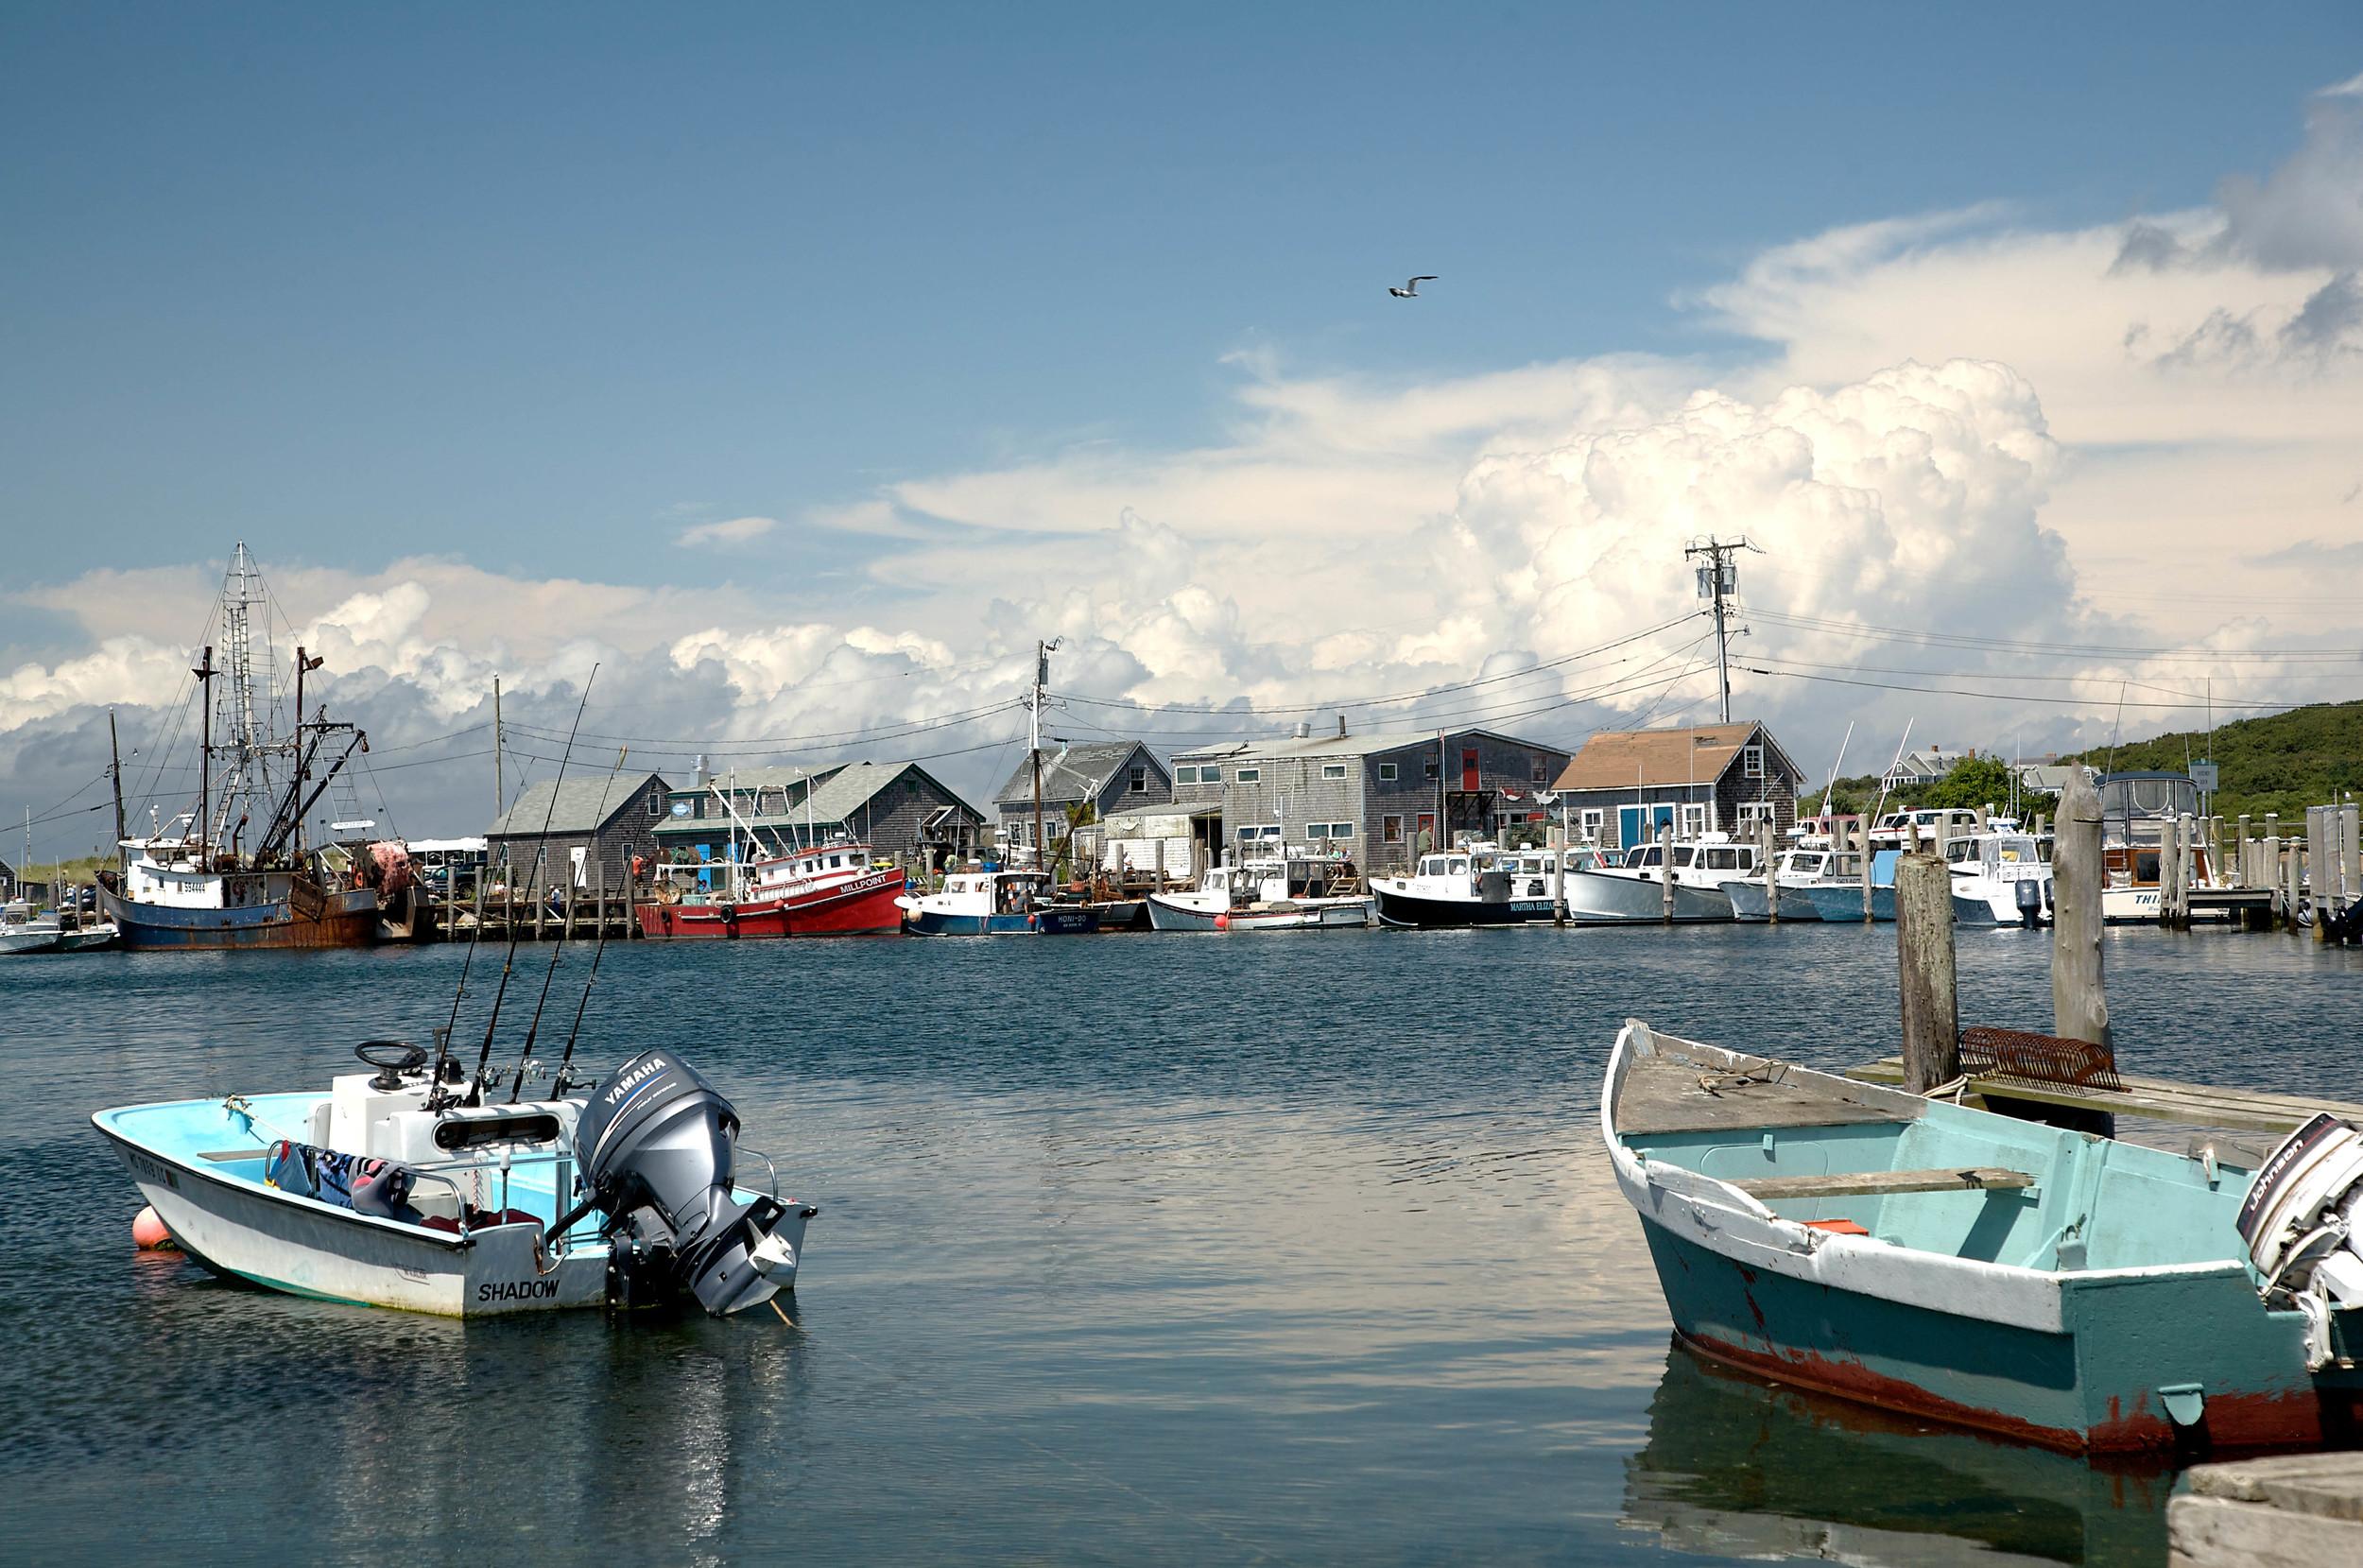 Menemsha Harbor II, Menemsha Fishing Village